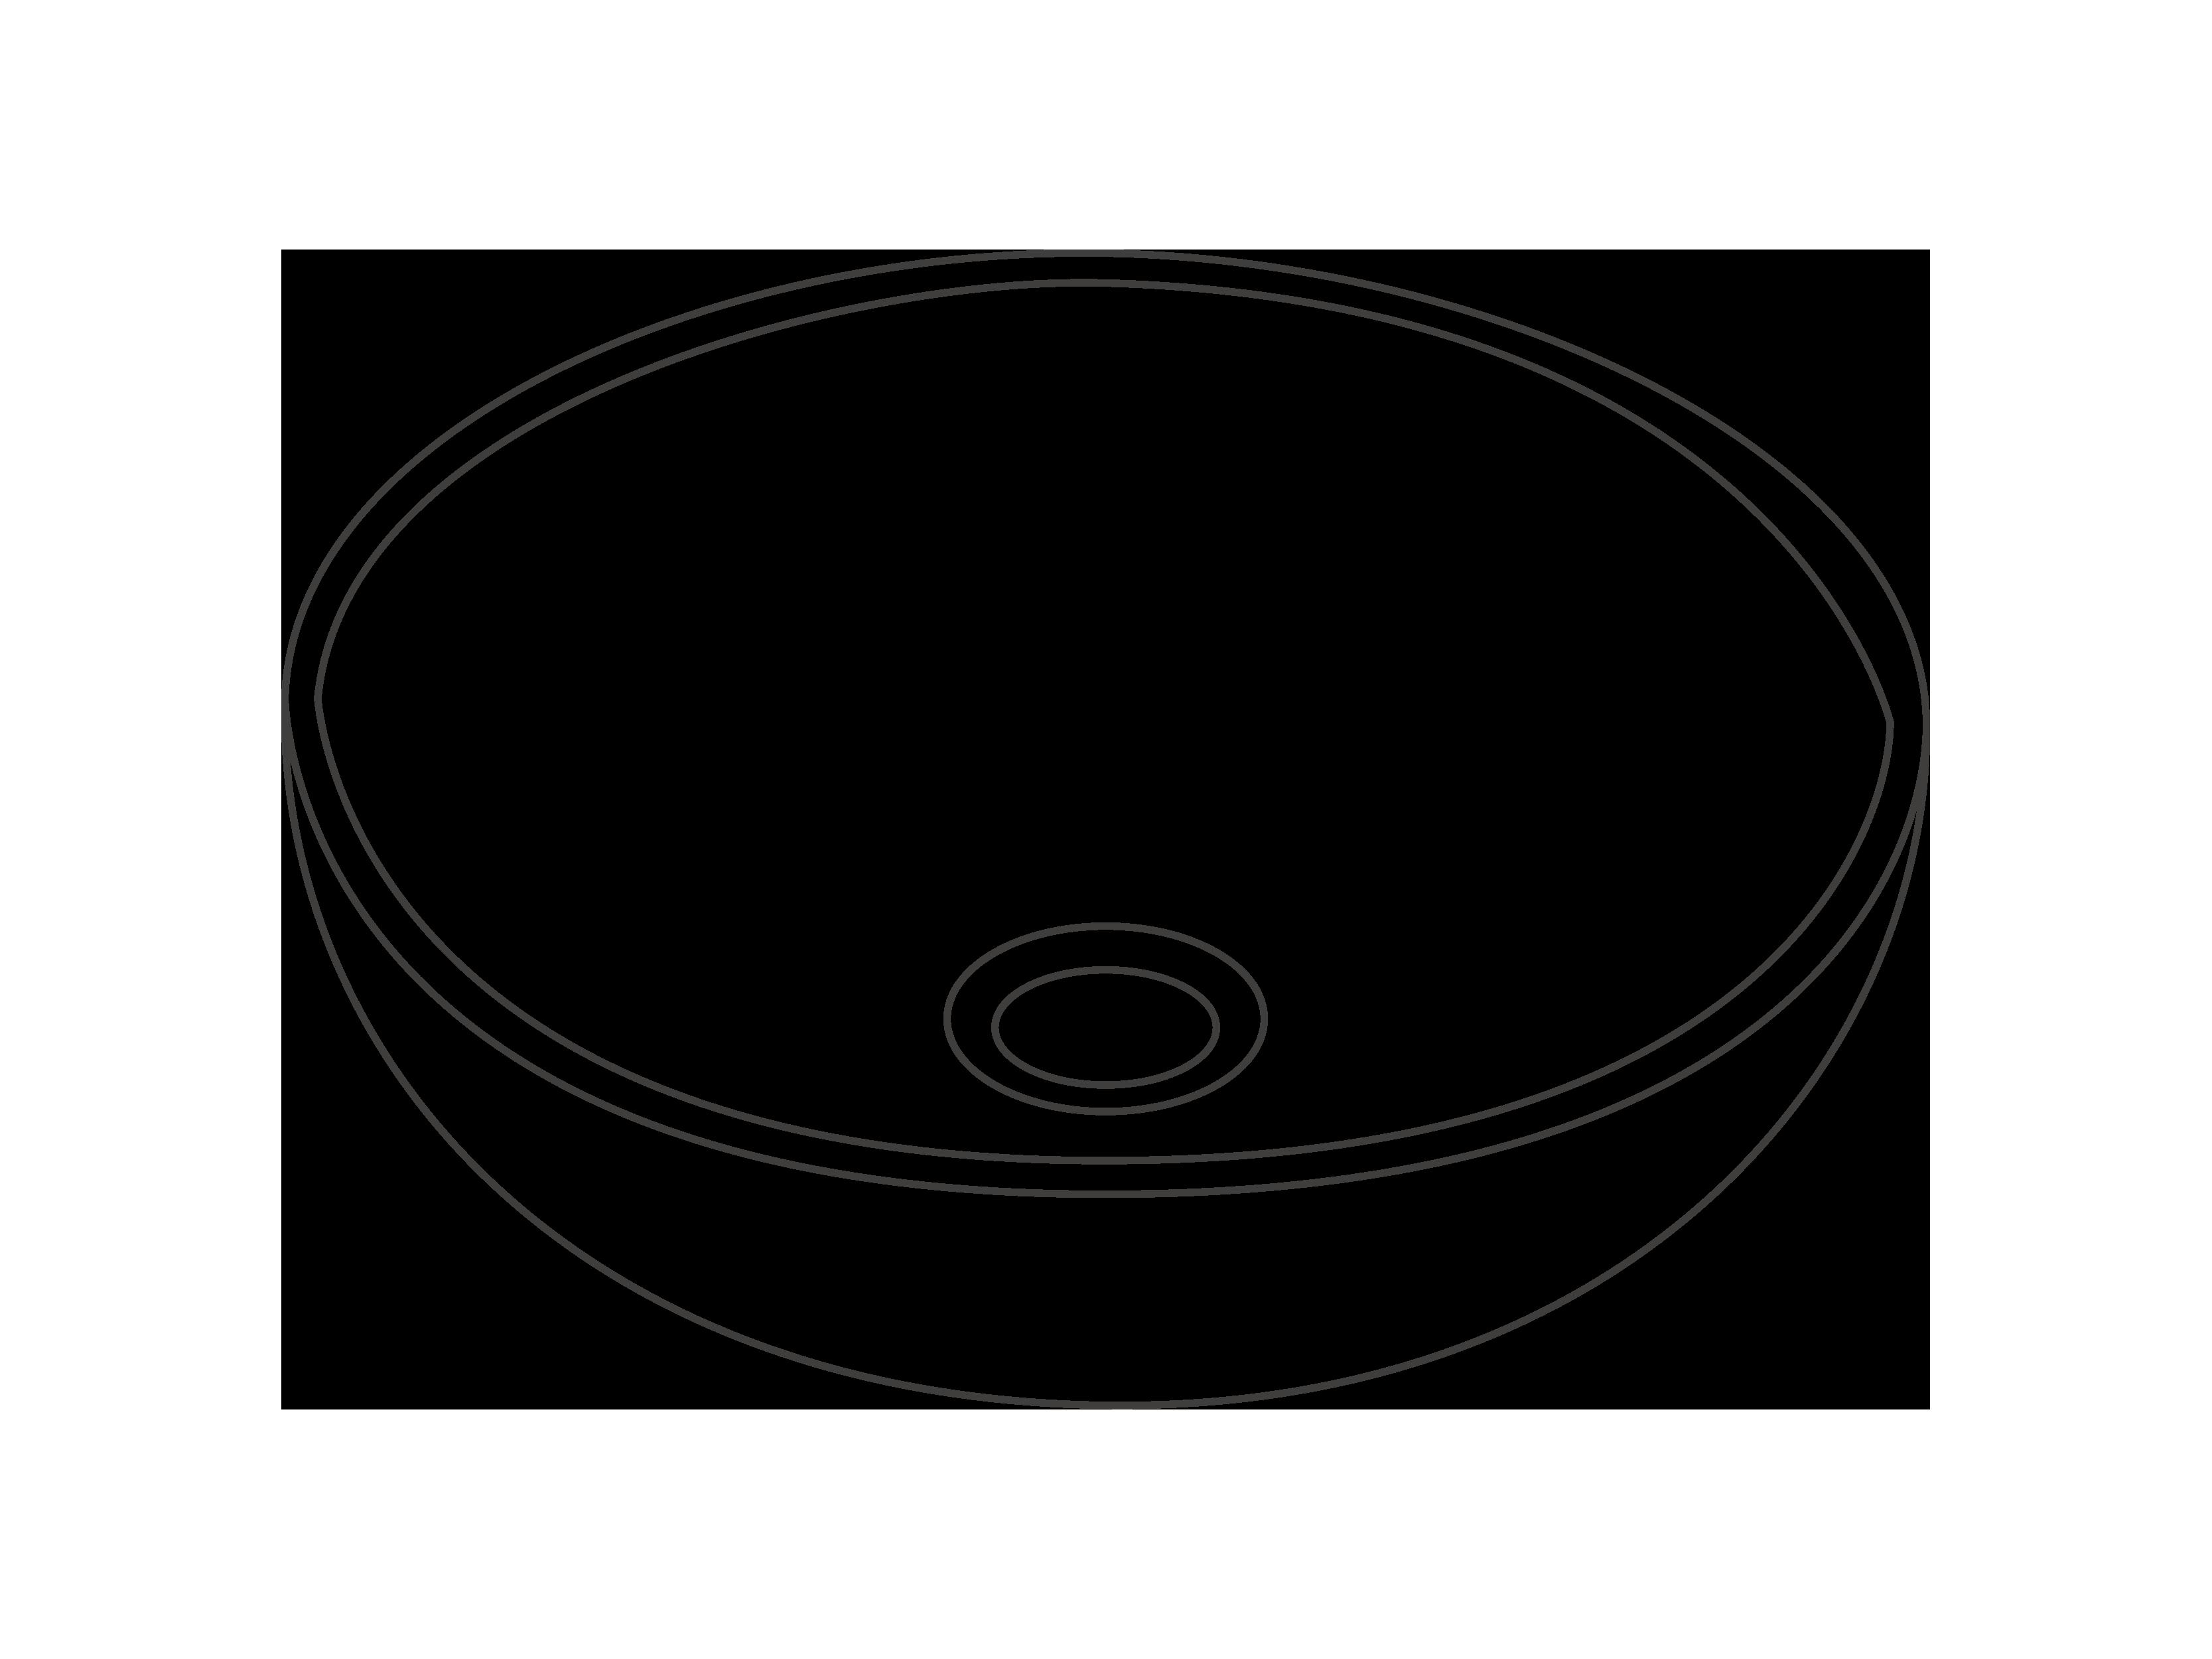 ON-TOP CIRCLE